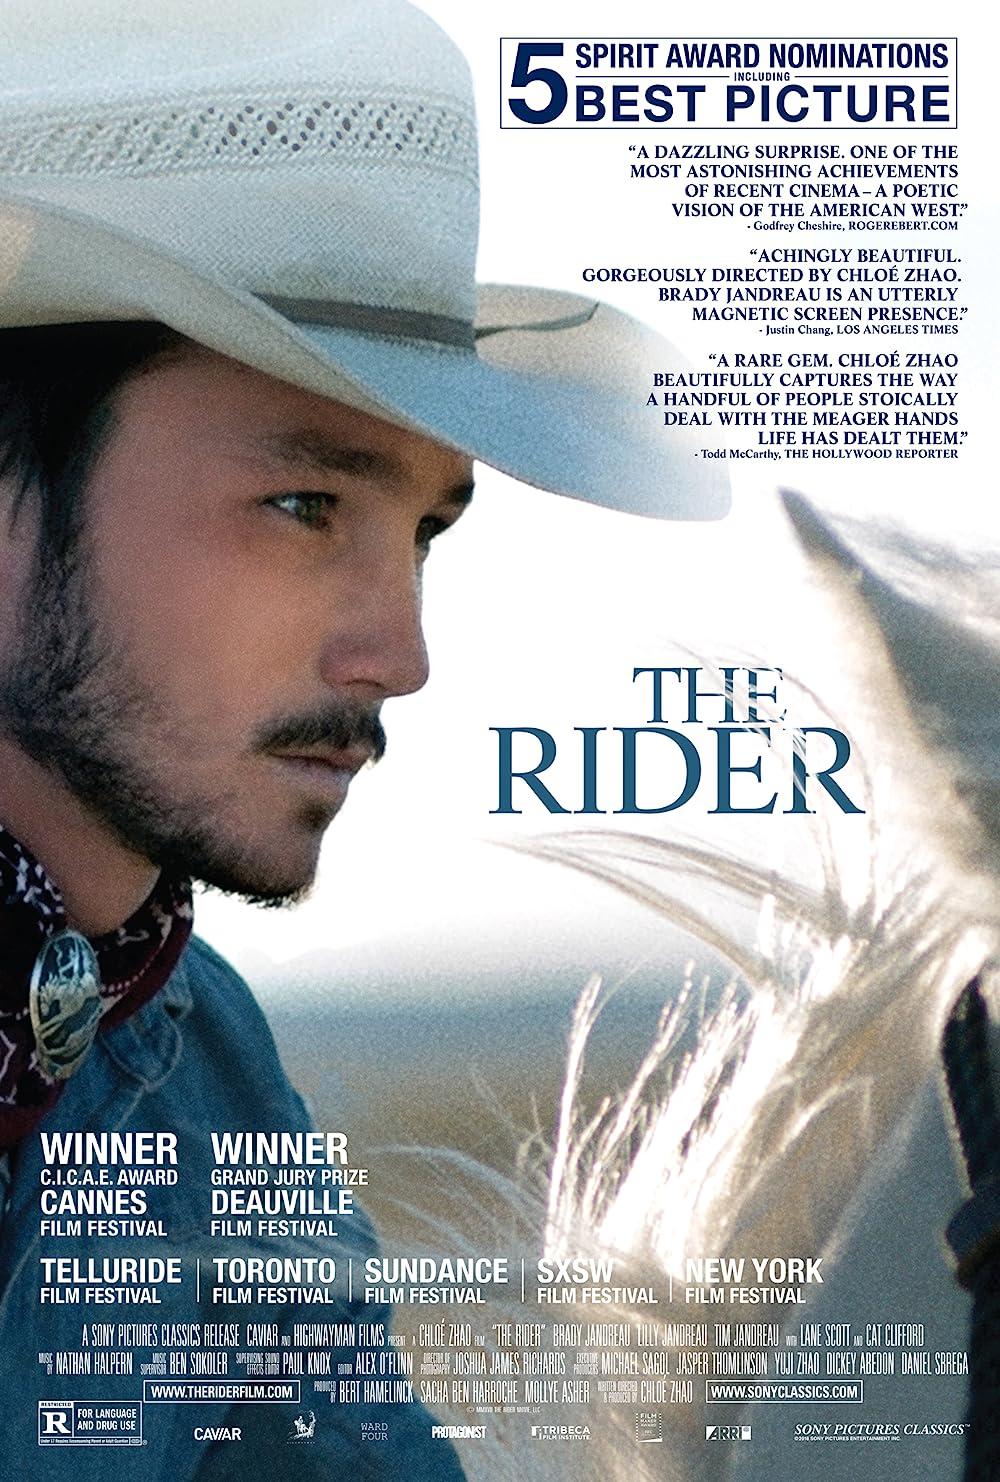 Brady Jandreau in The Rider (2017)